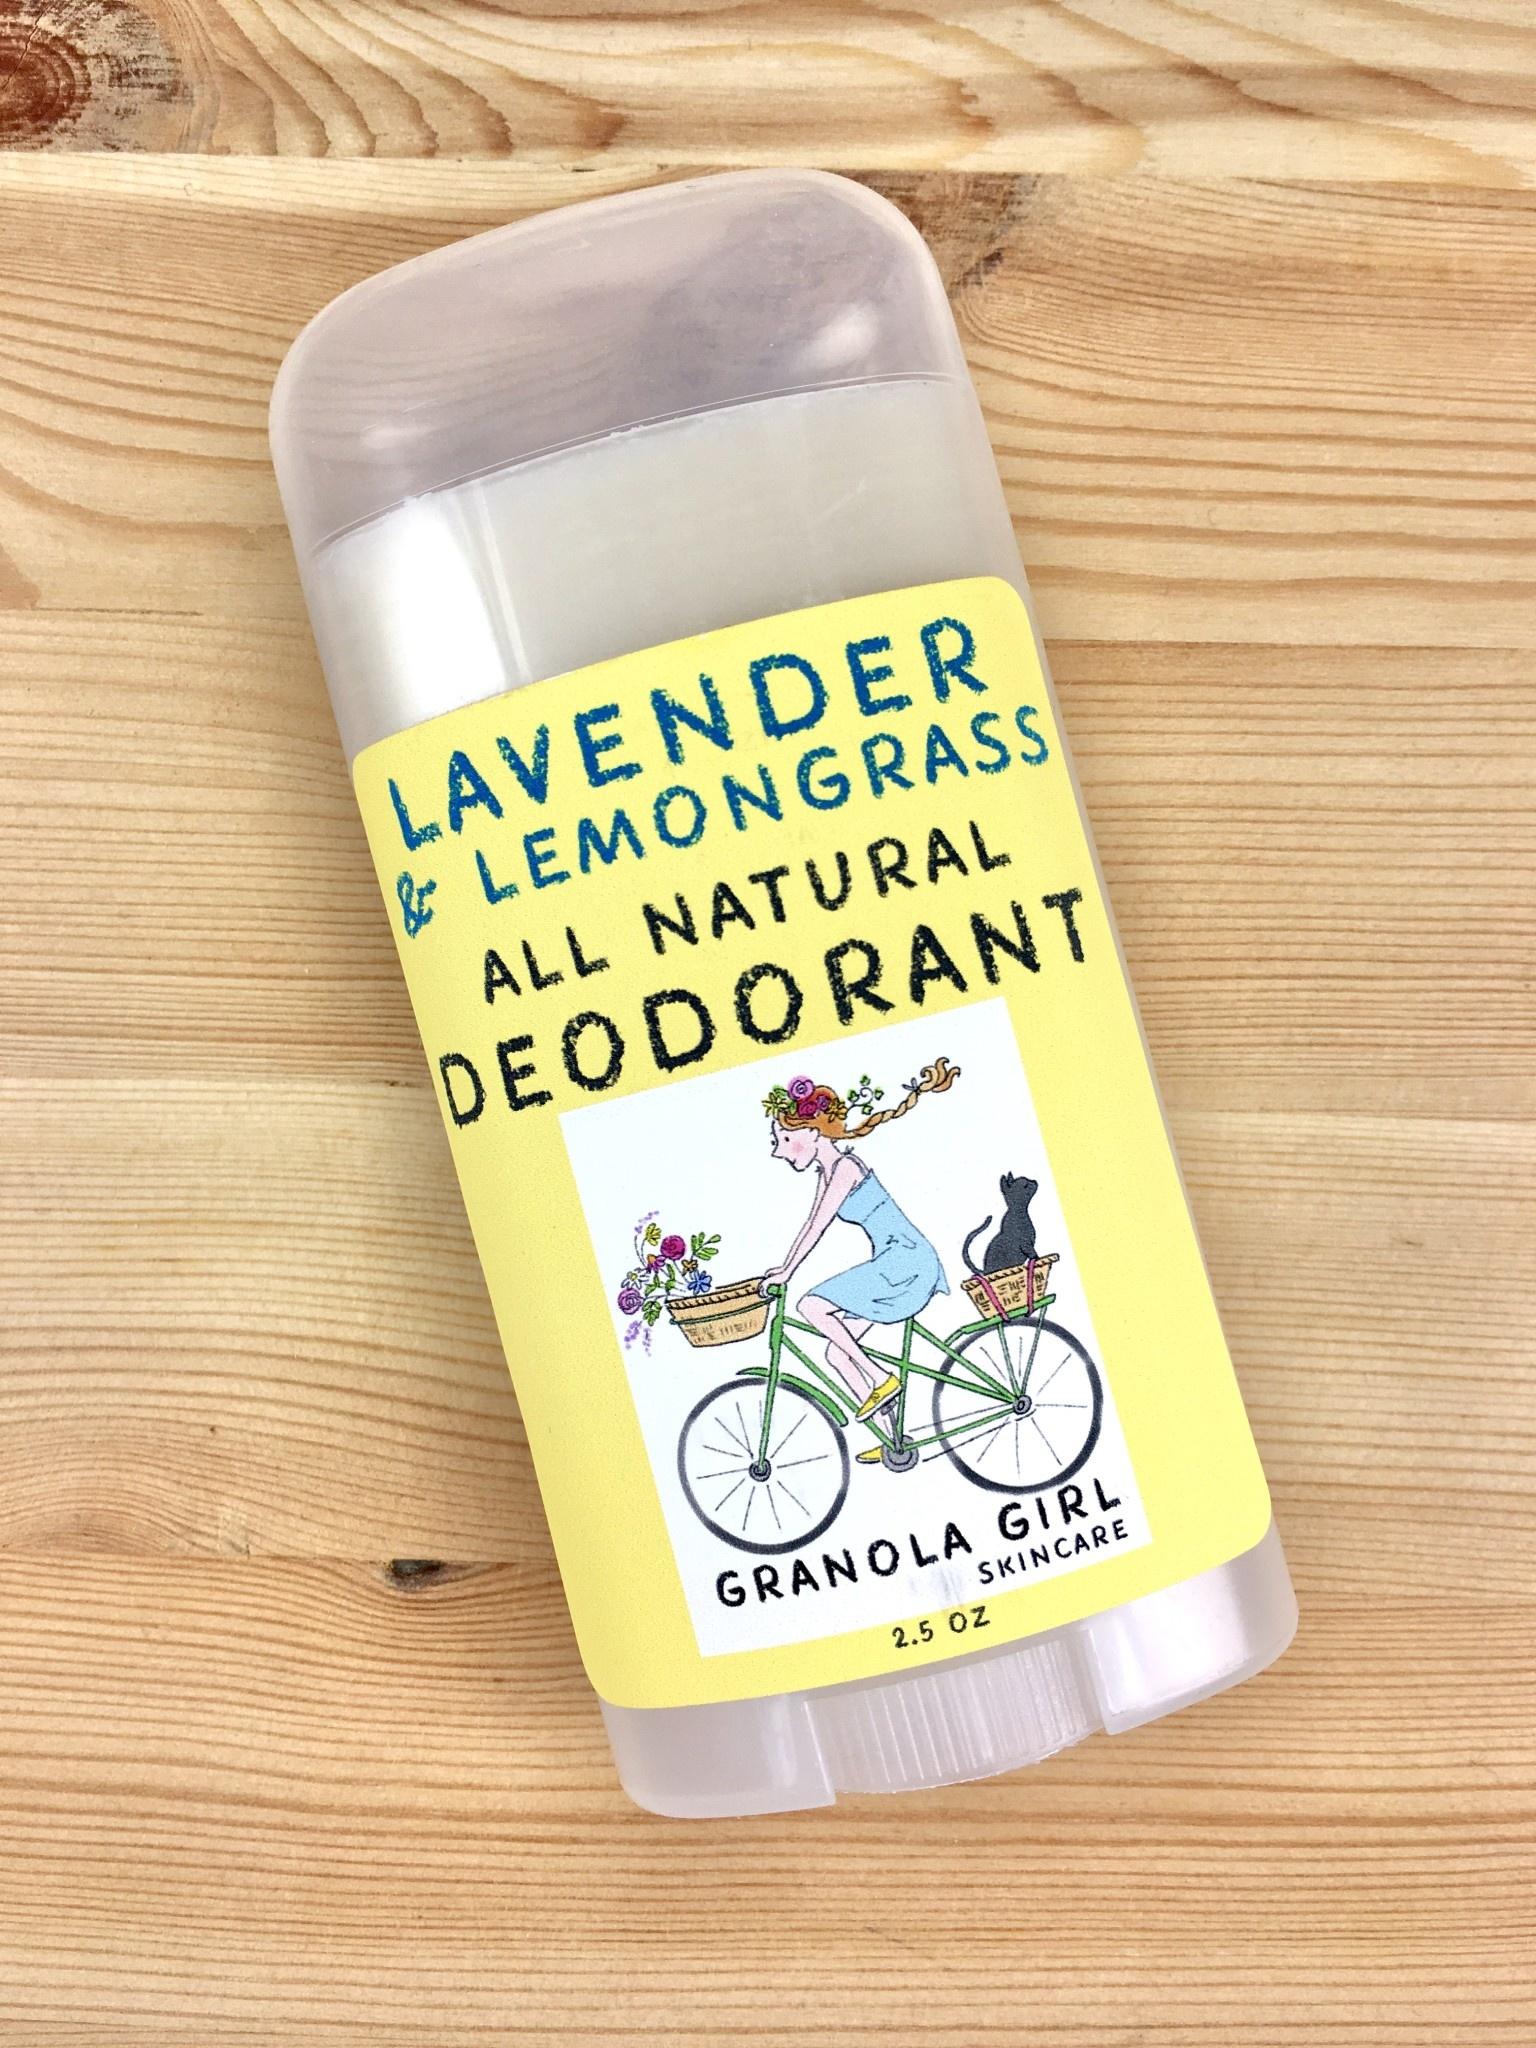 Granola Girl Skincare /Teehaus Bath + Body Lavender & Lemongrass Deodorant